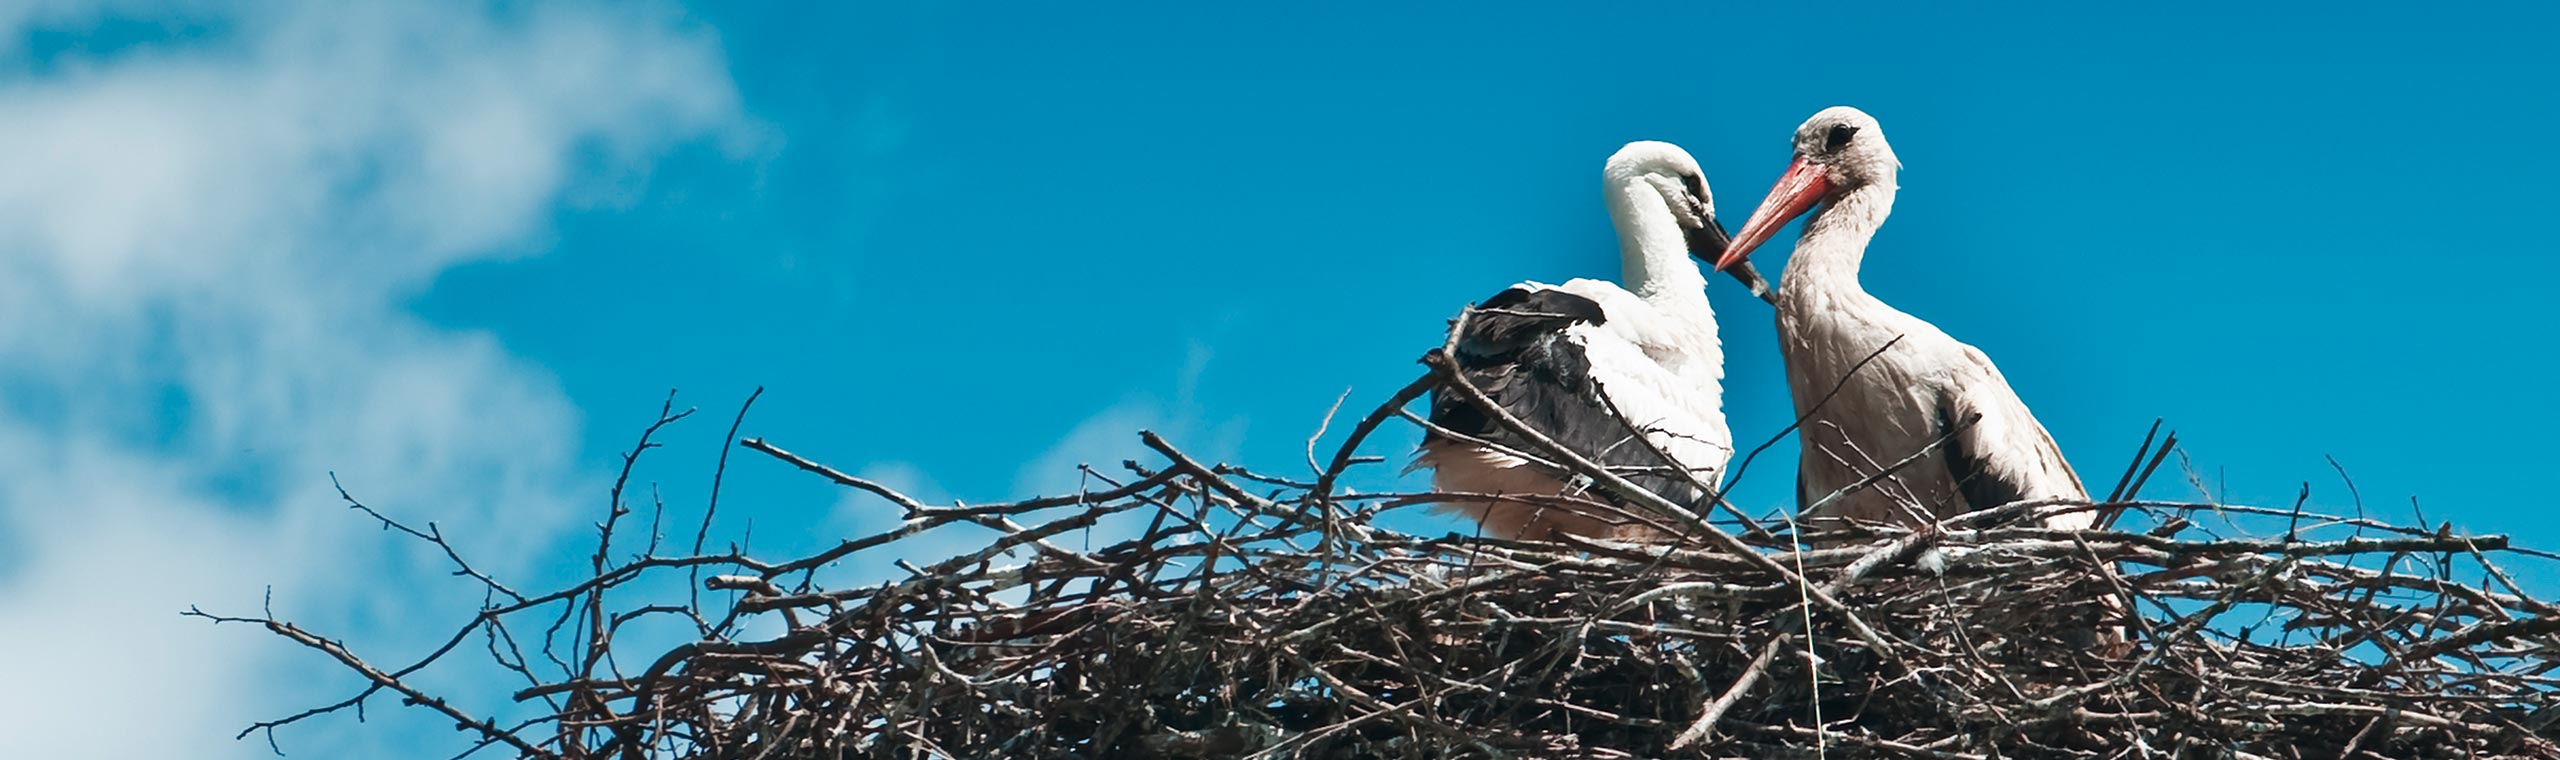 Stoerche im Nest